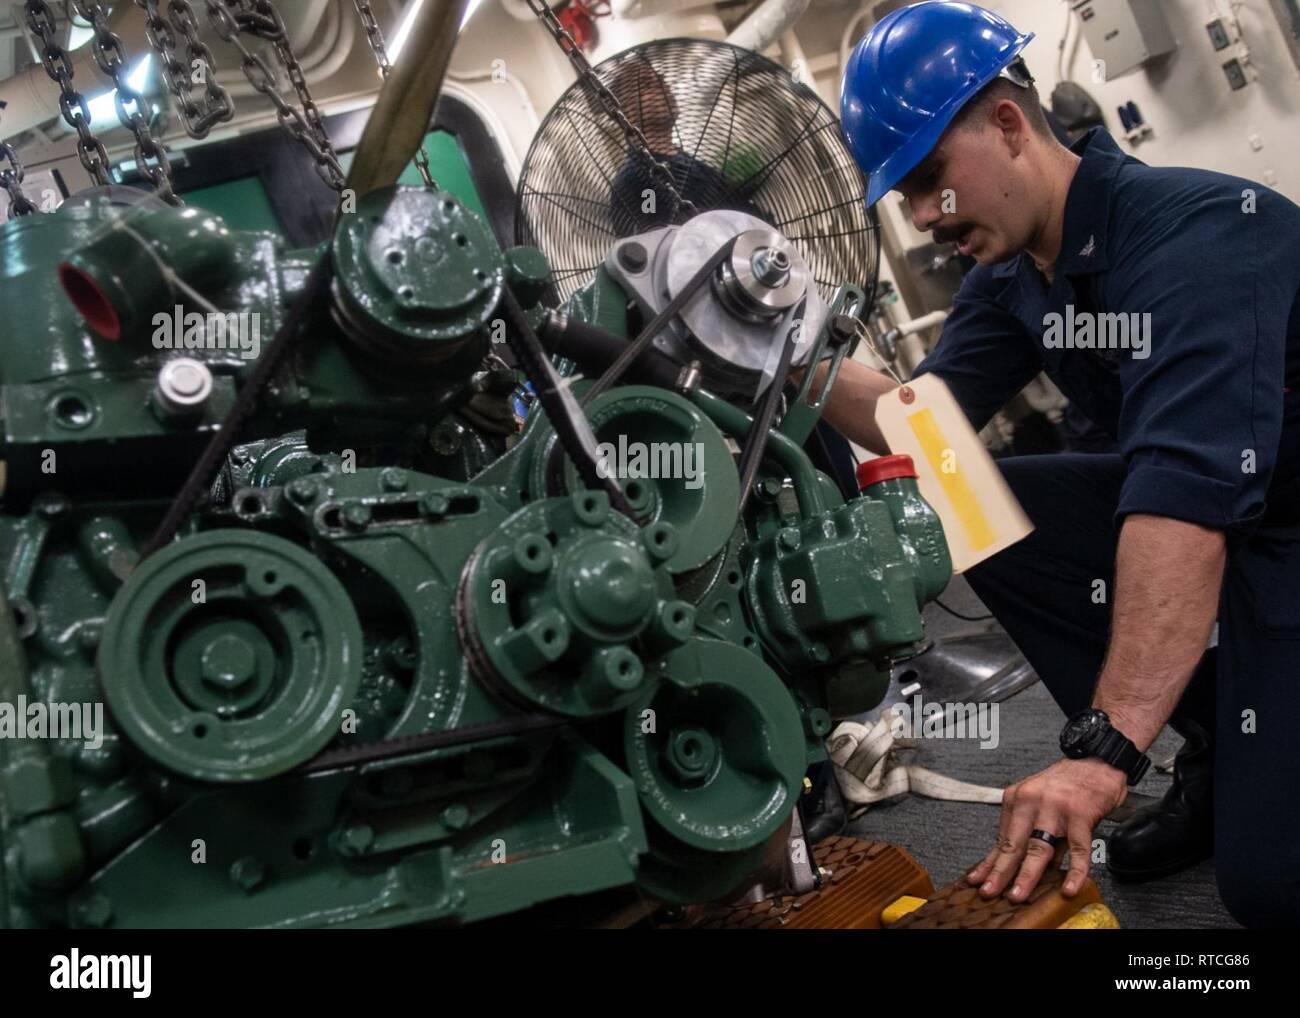 Garrett Engine Stock Photos & Garrett Engine Stock Images - Alamy